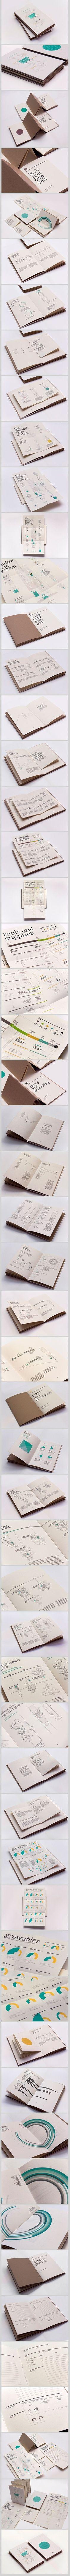 pinterest megan_lewis/art-and-design